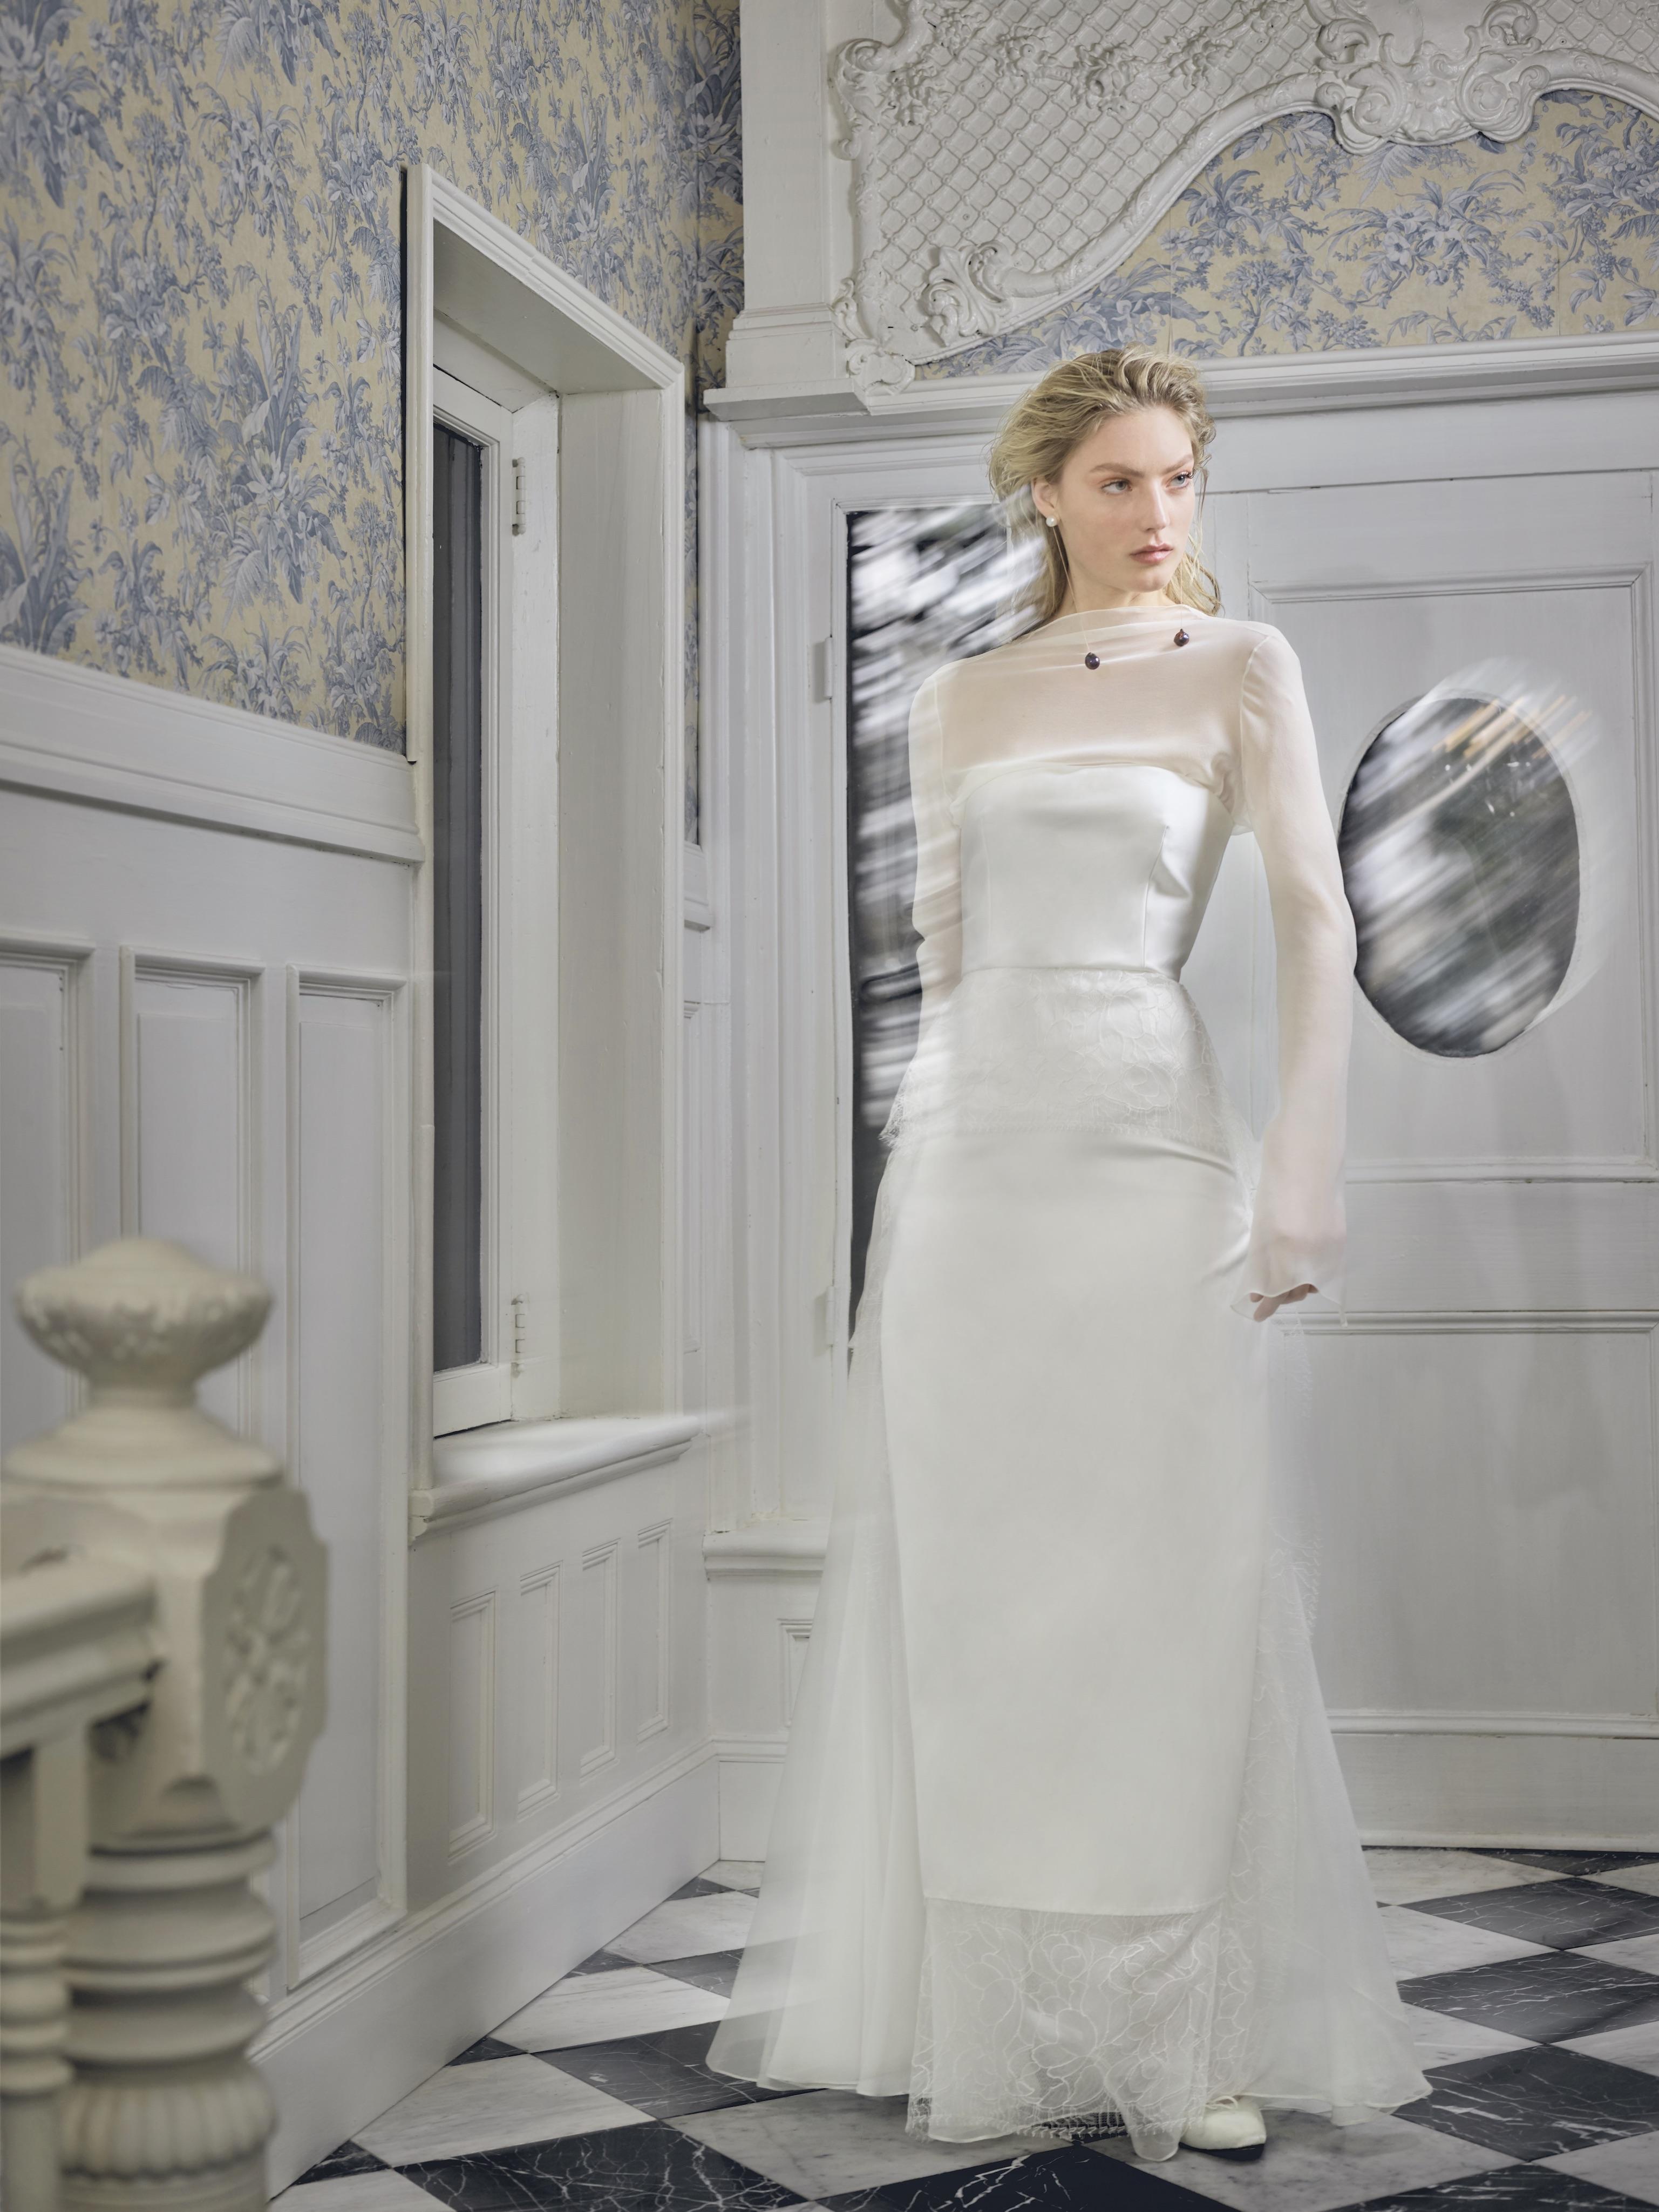 danielle frankel wedding dress spring 2019 high illusion neck long sleeves